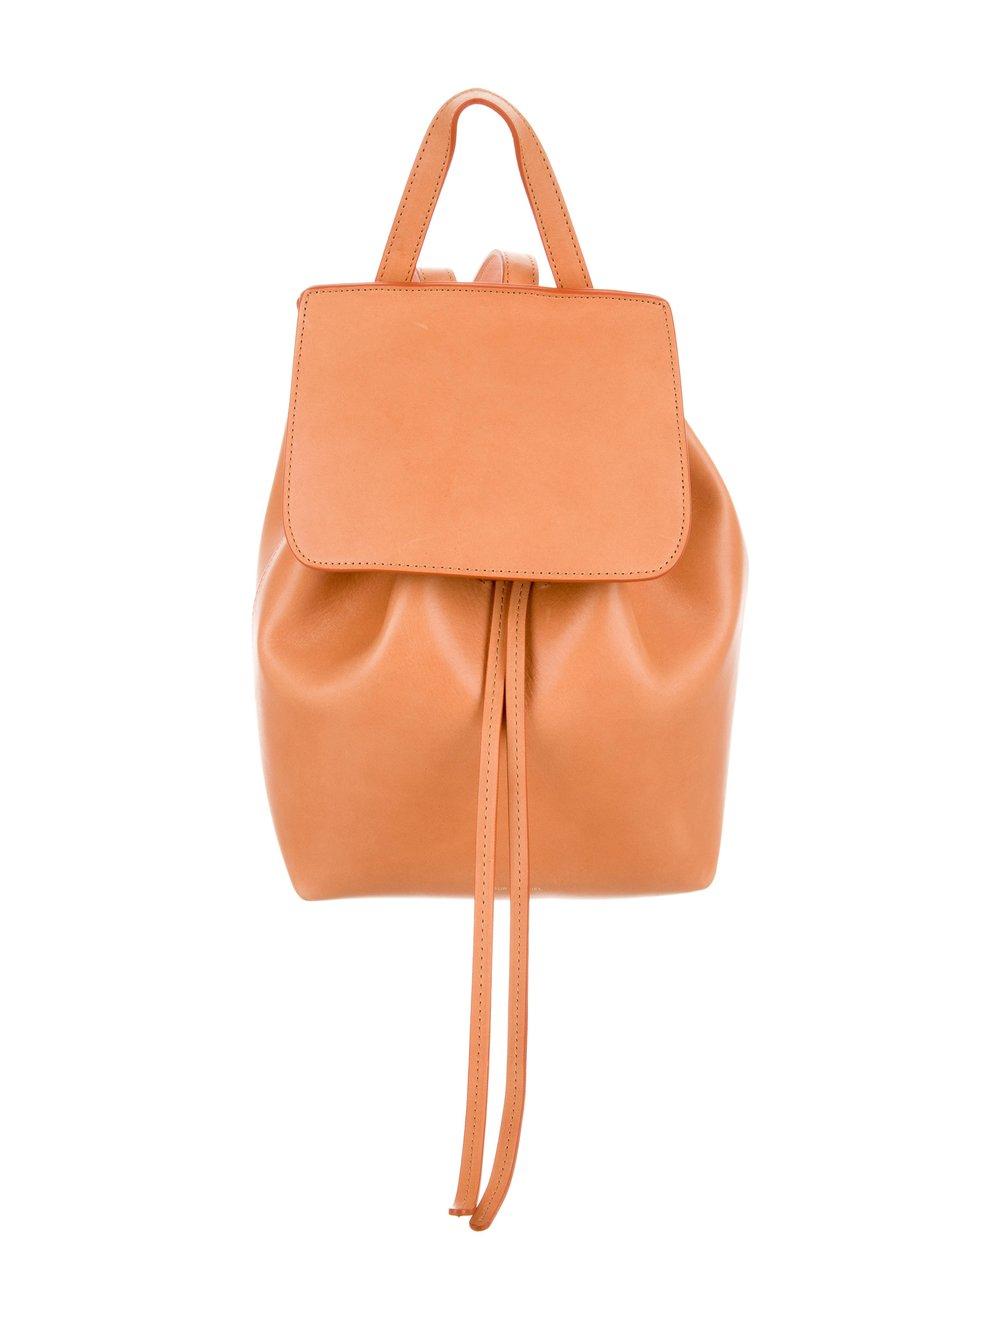 MANSUR GAVRIEL   Mini Backpack, $521.50, therealreal.com